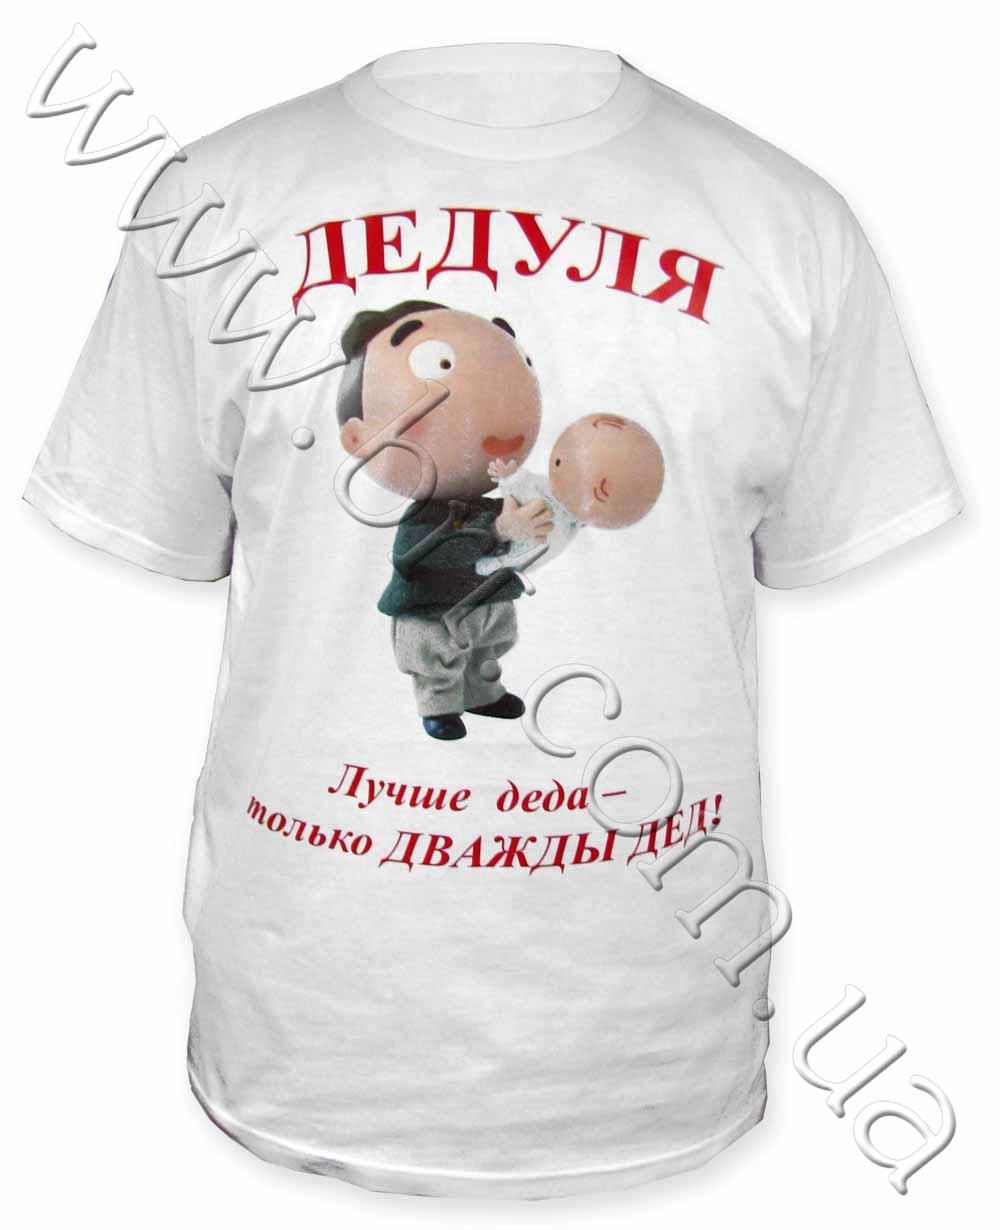 Подарки на день рождения фото на футболки